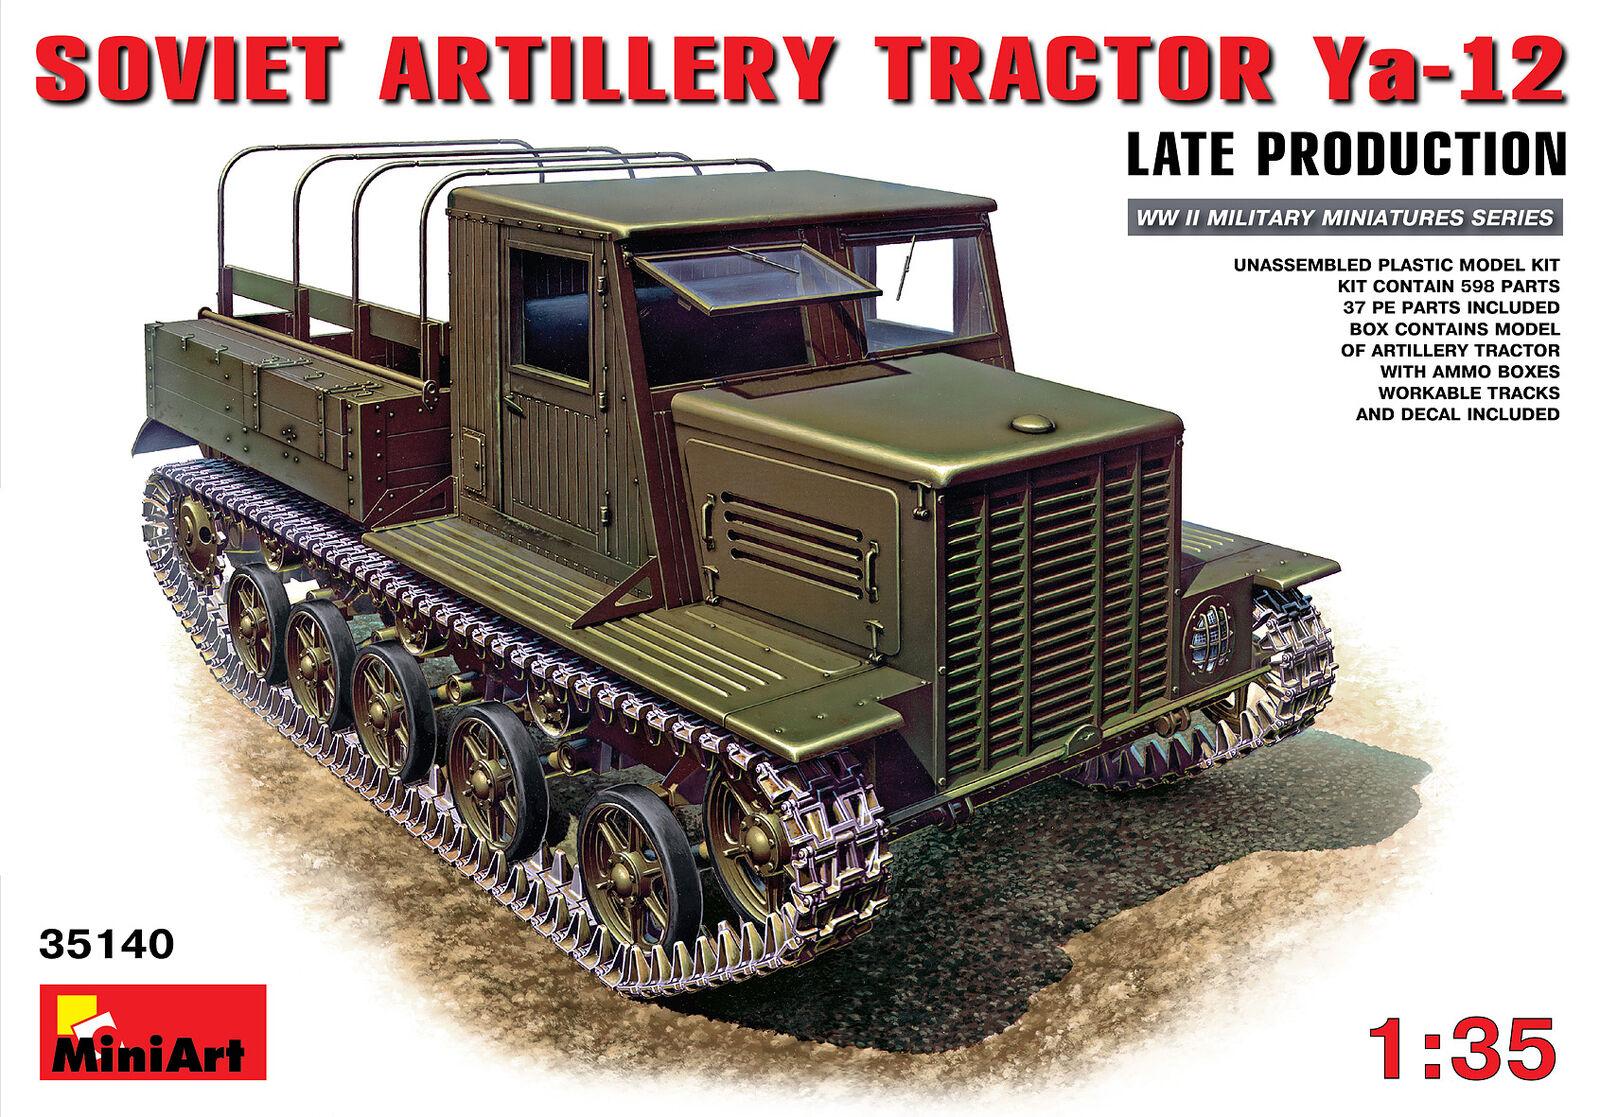 Miniart 1 35 Ya-12 Late Prod Soviet Artillery Tractor